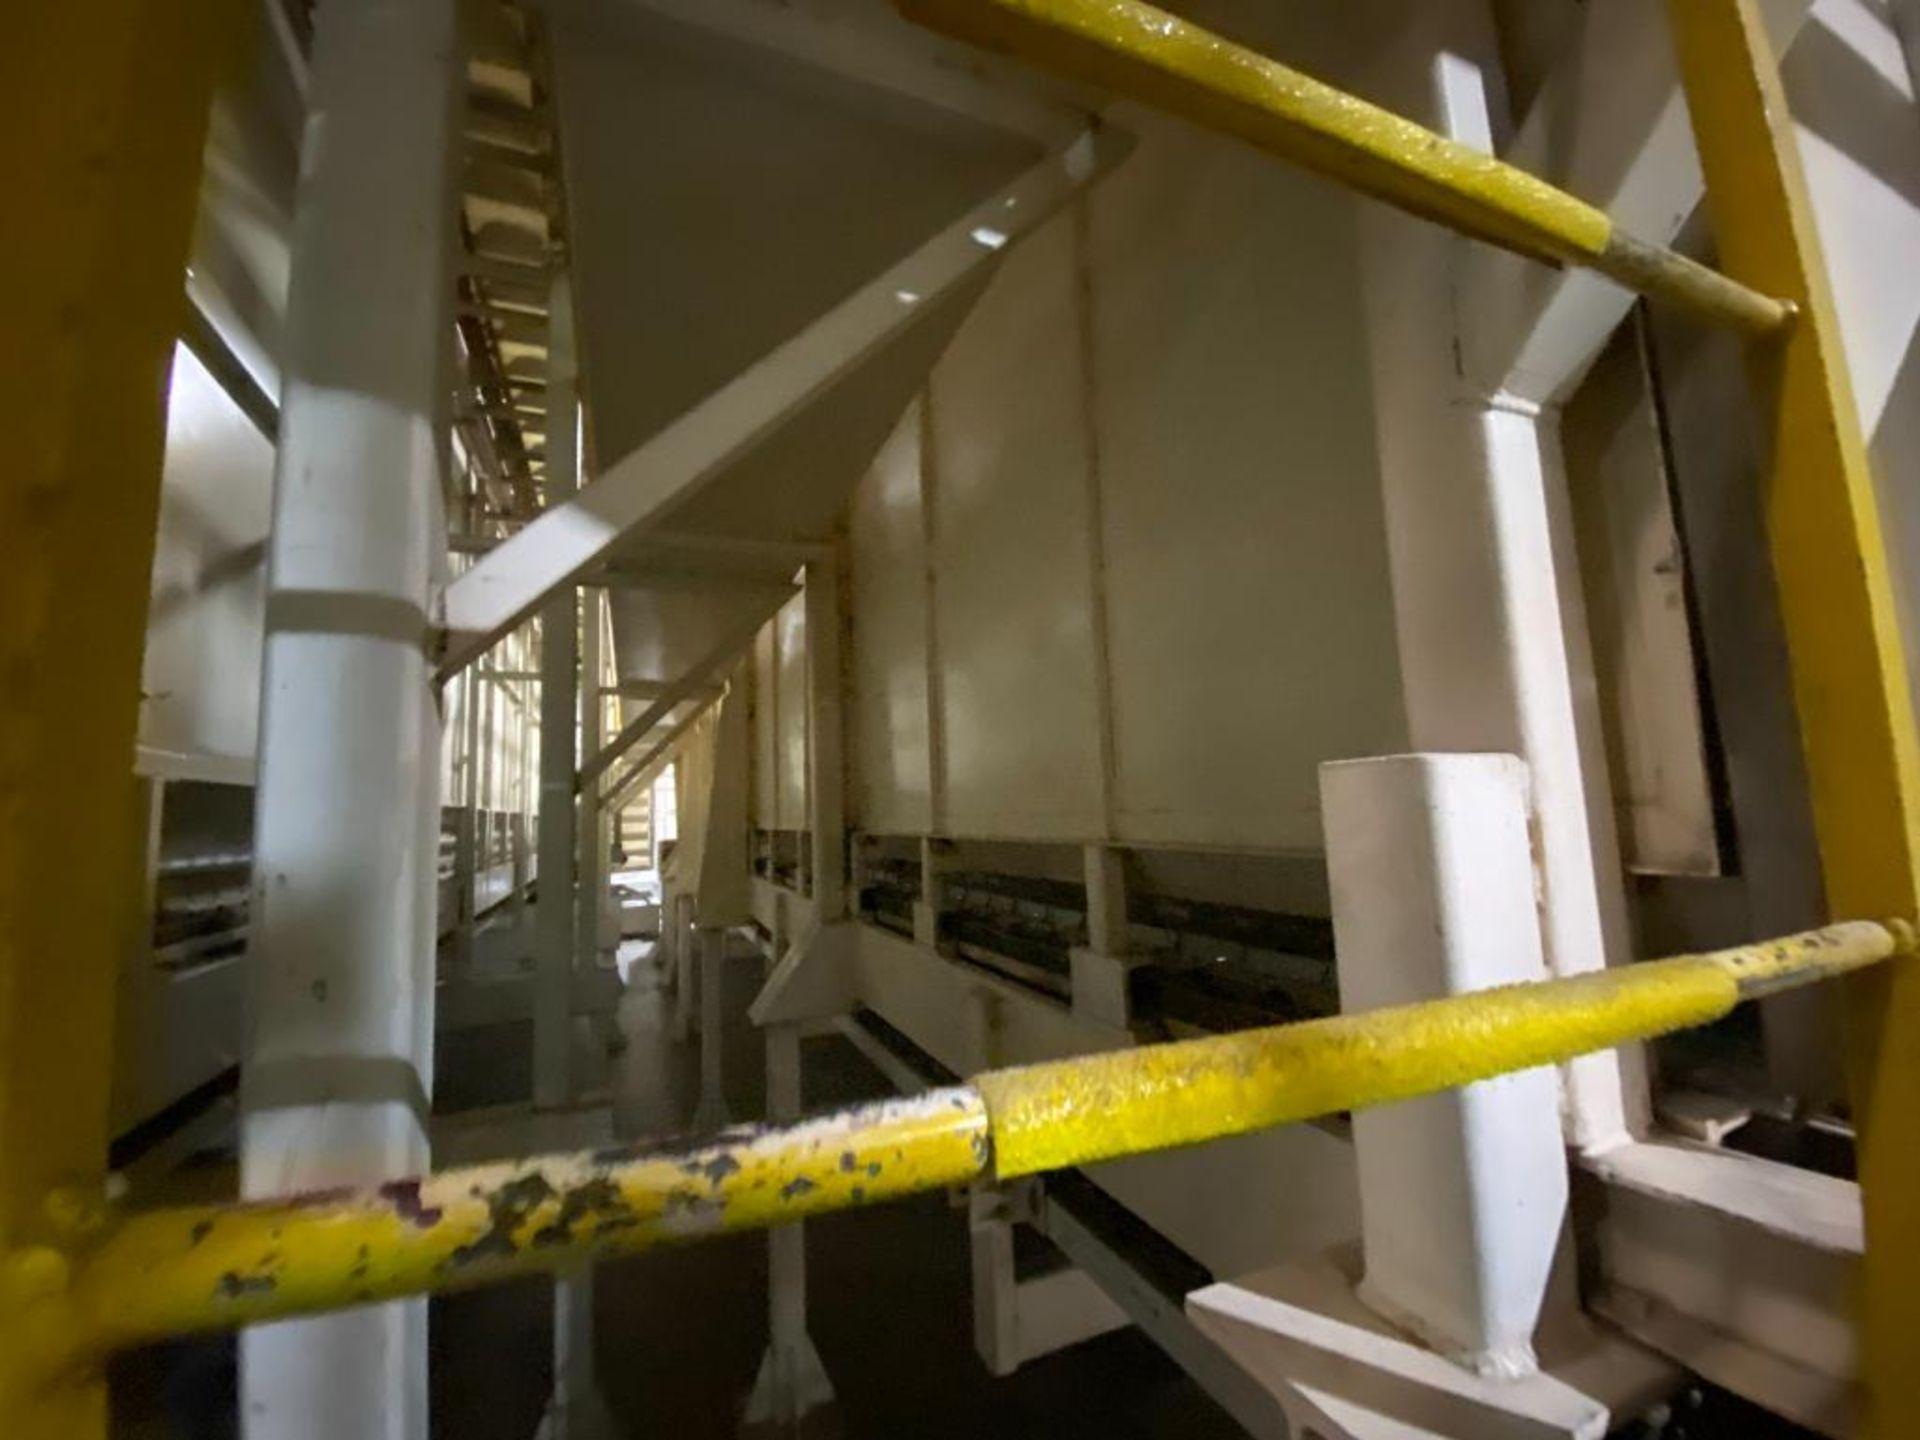 Aseeco bulk accumulation bin - Image 3 of 5